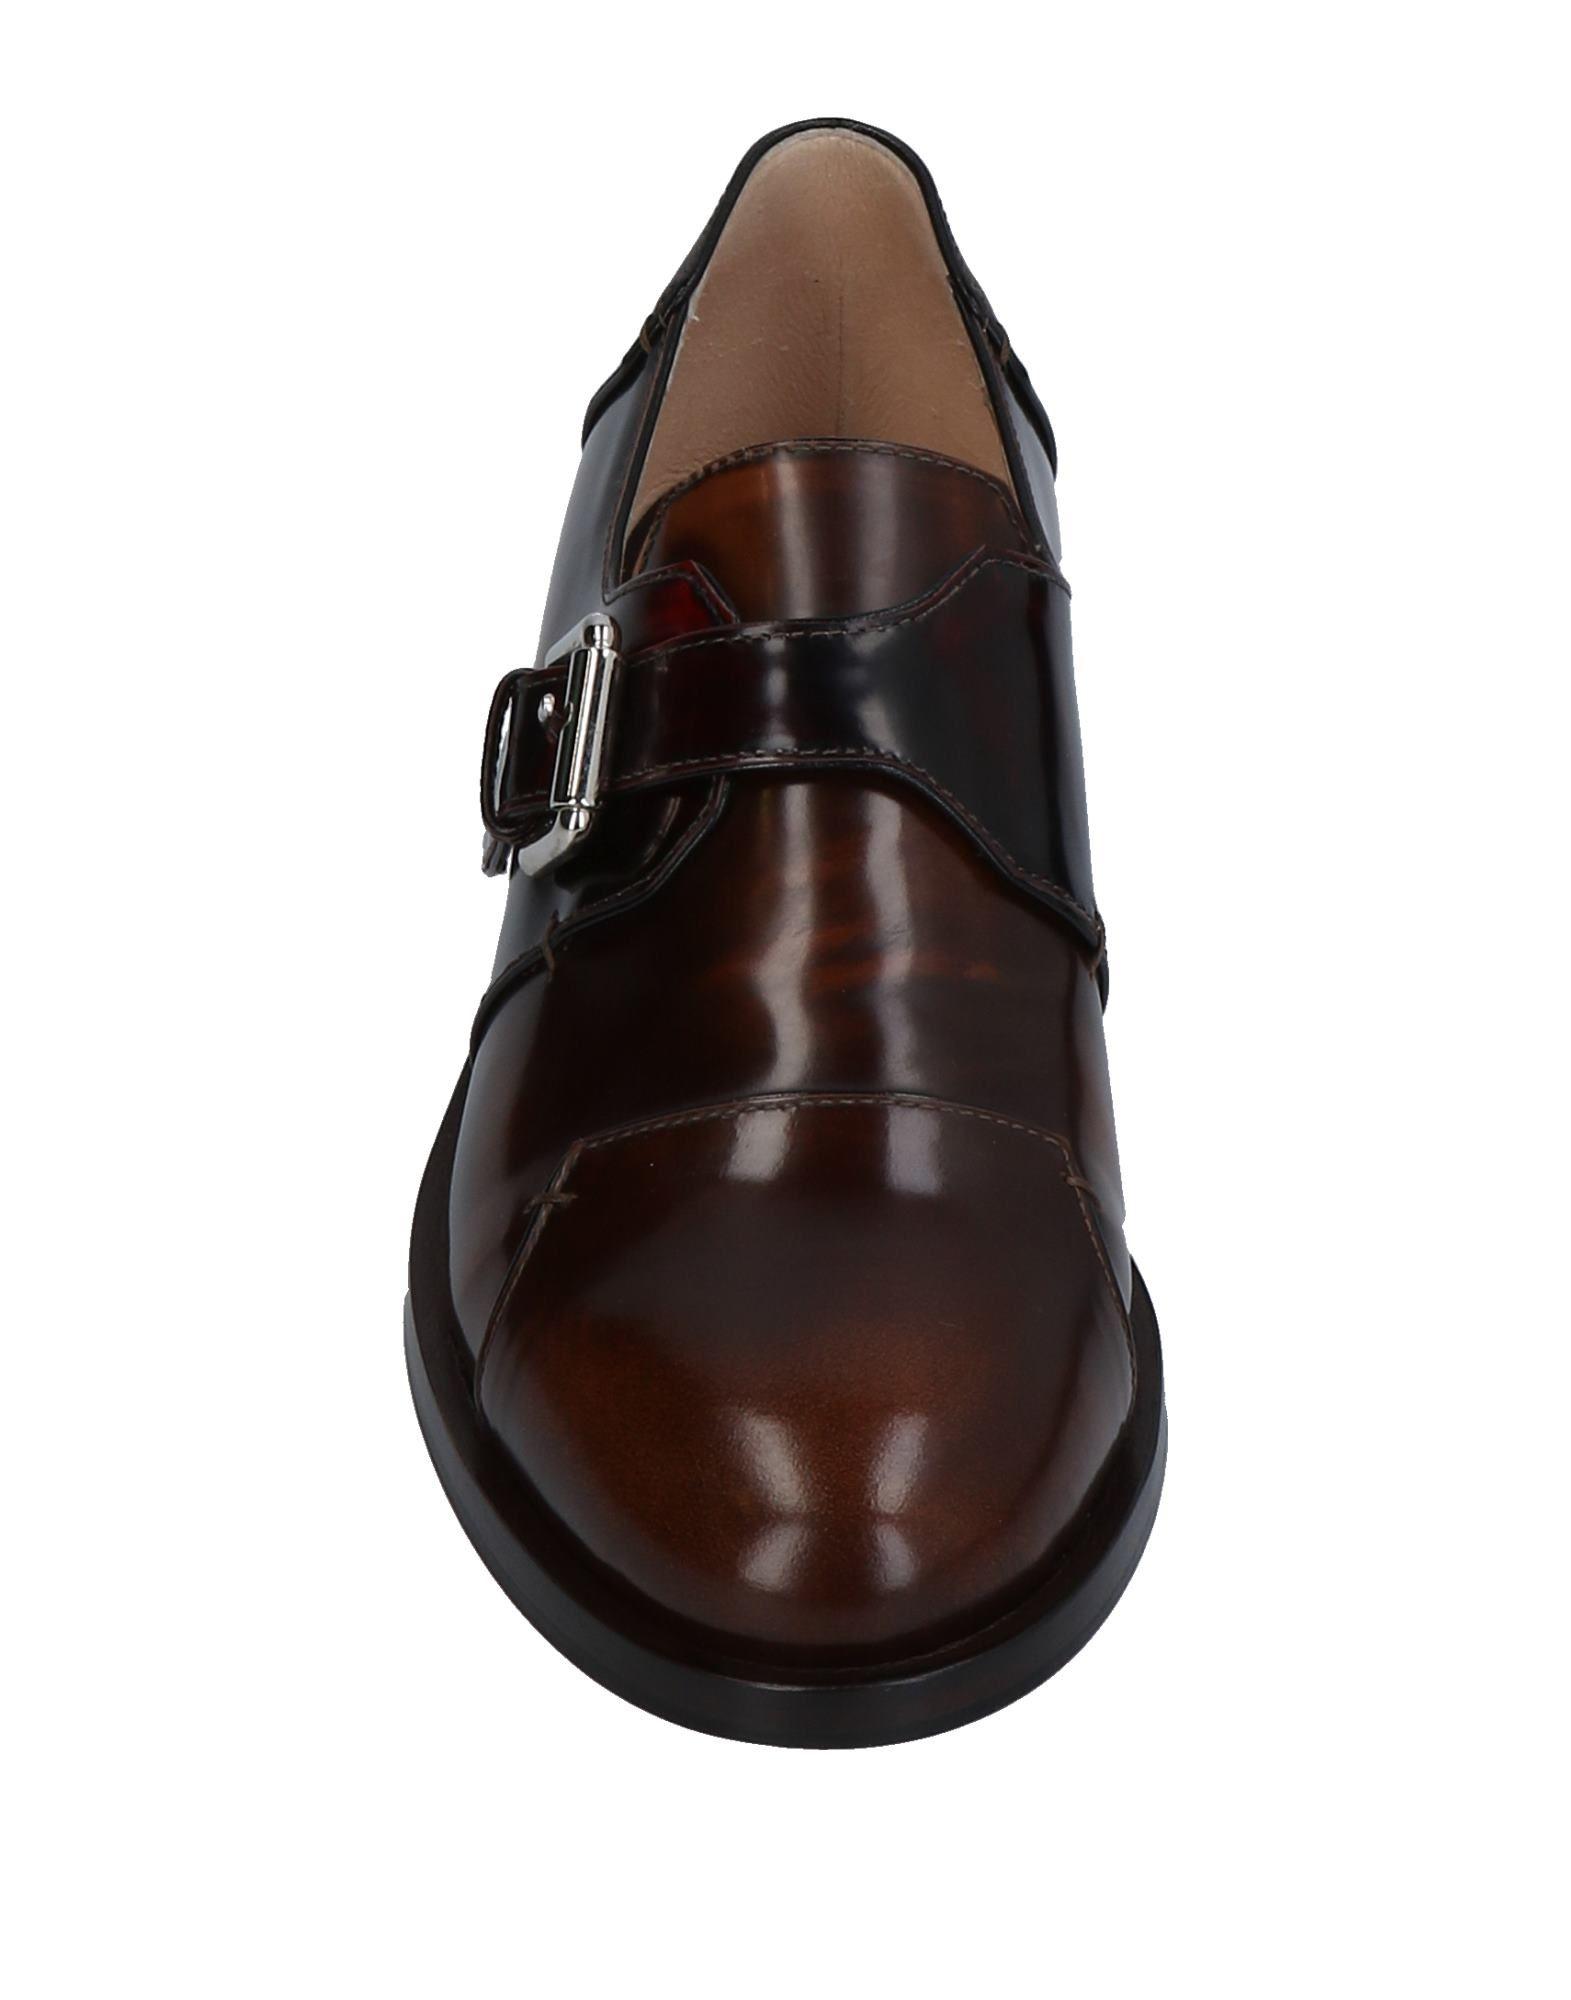 Kallistè Mokassins Damen  11460378JGGut aussehende strapazierfähige Schuhe